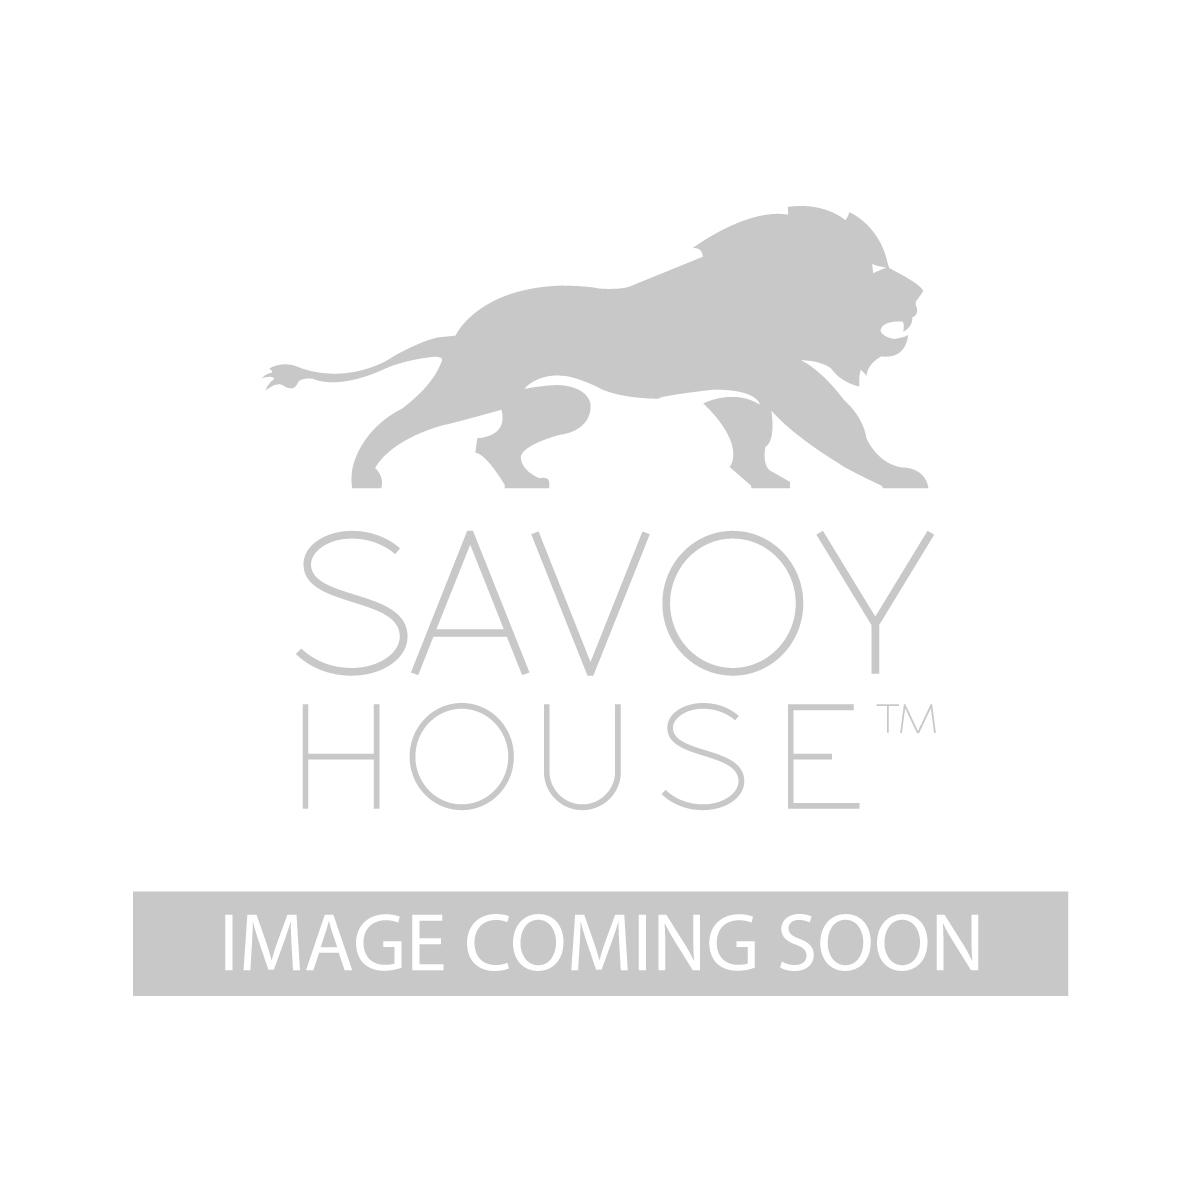 8 9130 4 109 drake 4 light bath bar by savoy house drake 4 light bath bar aloadofball Images